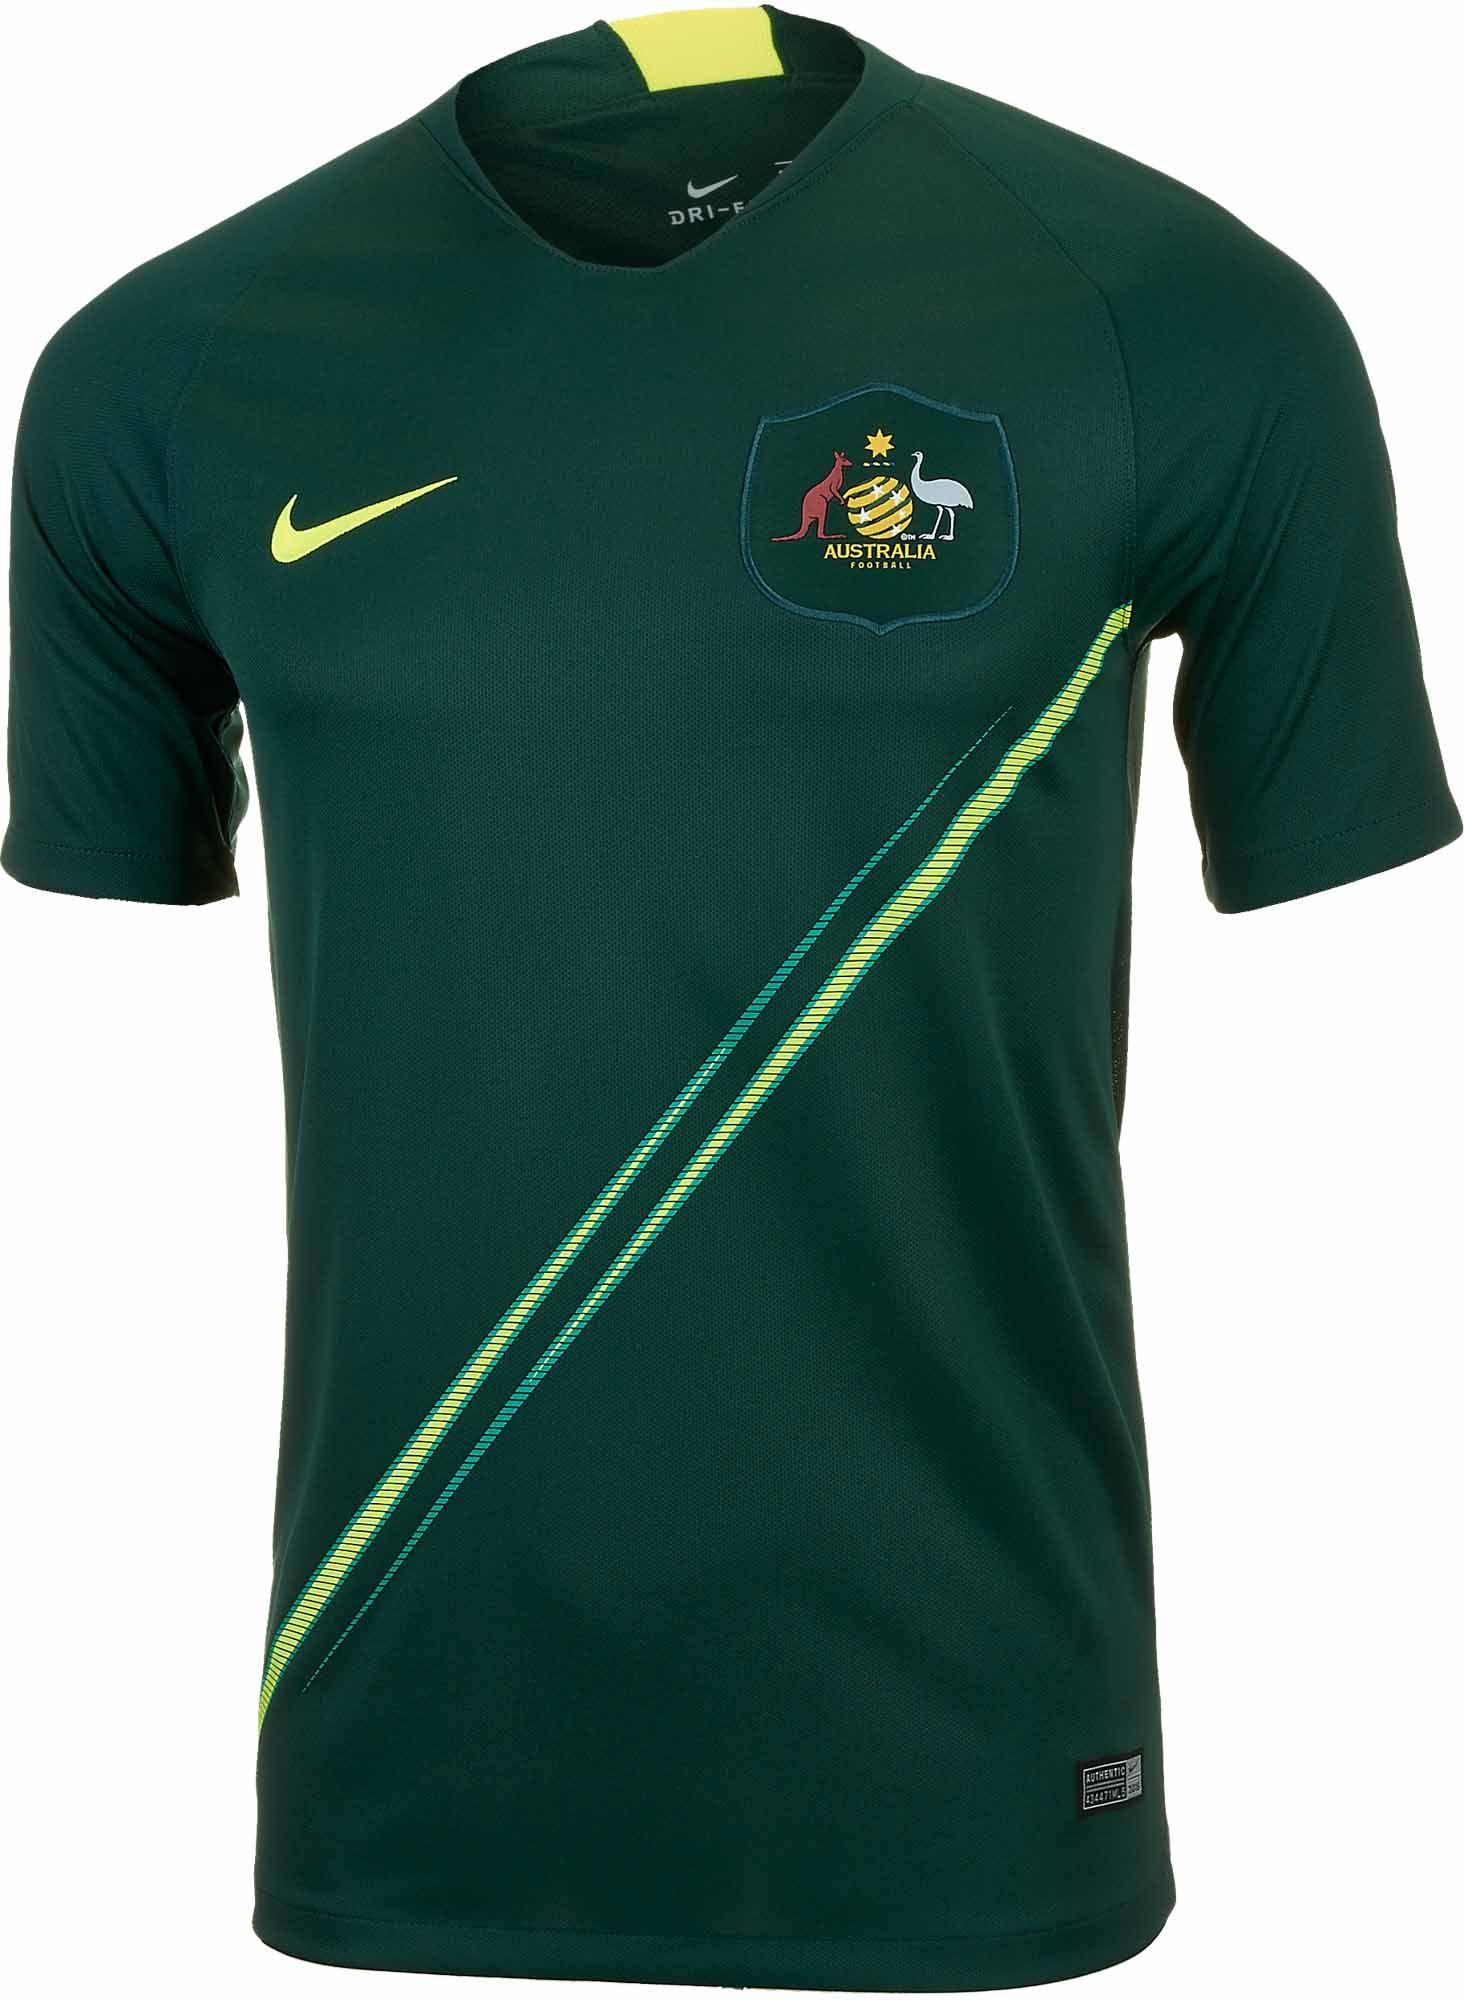 525d4e1f985 Nike Australia Away Jersey 2018-19 | World Cup Soccer Jerseys & Gear ...